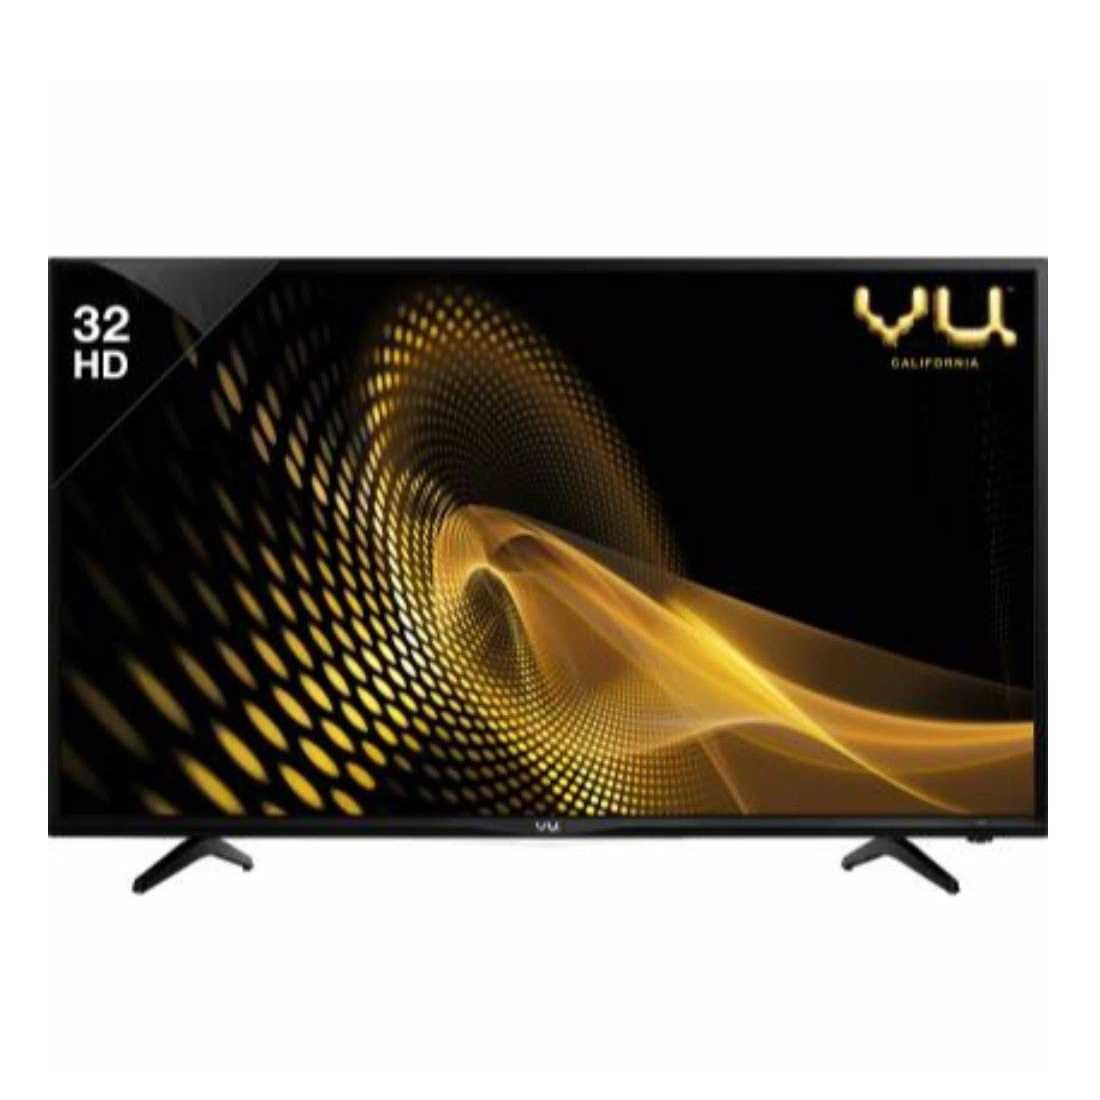 Vu 32GVPL 32 Inch HD Ready LED Television